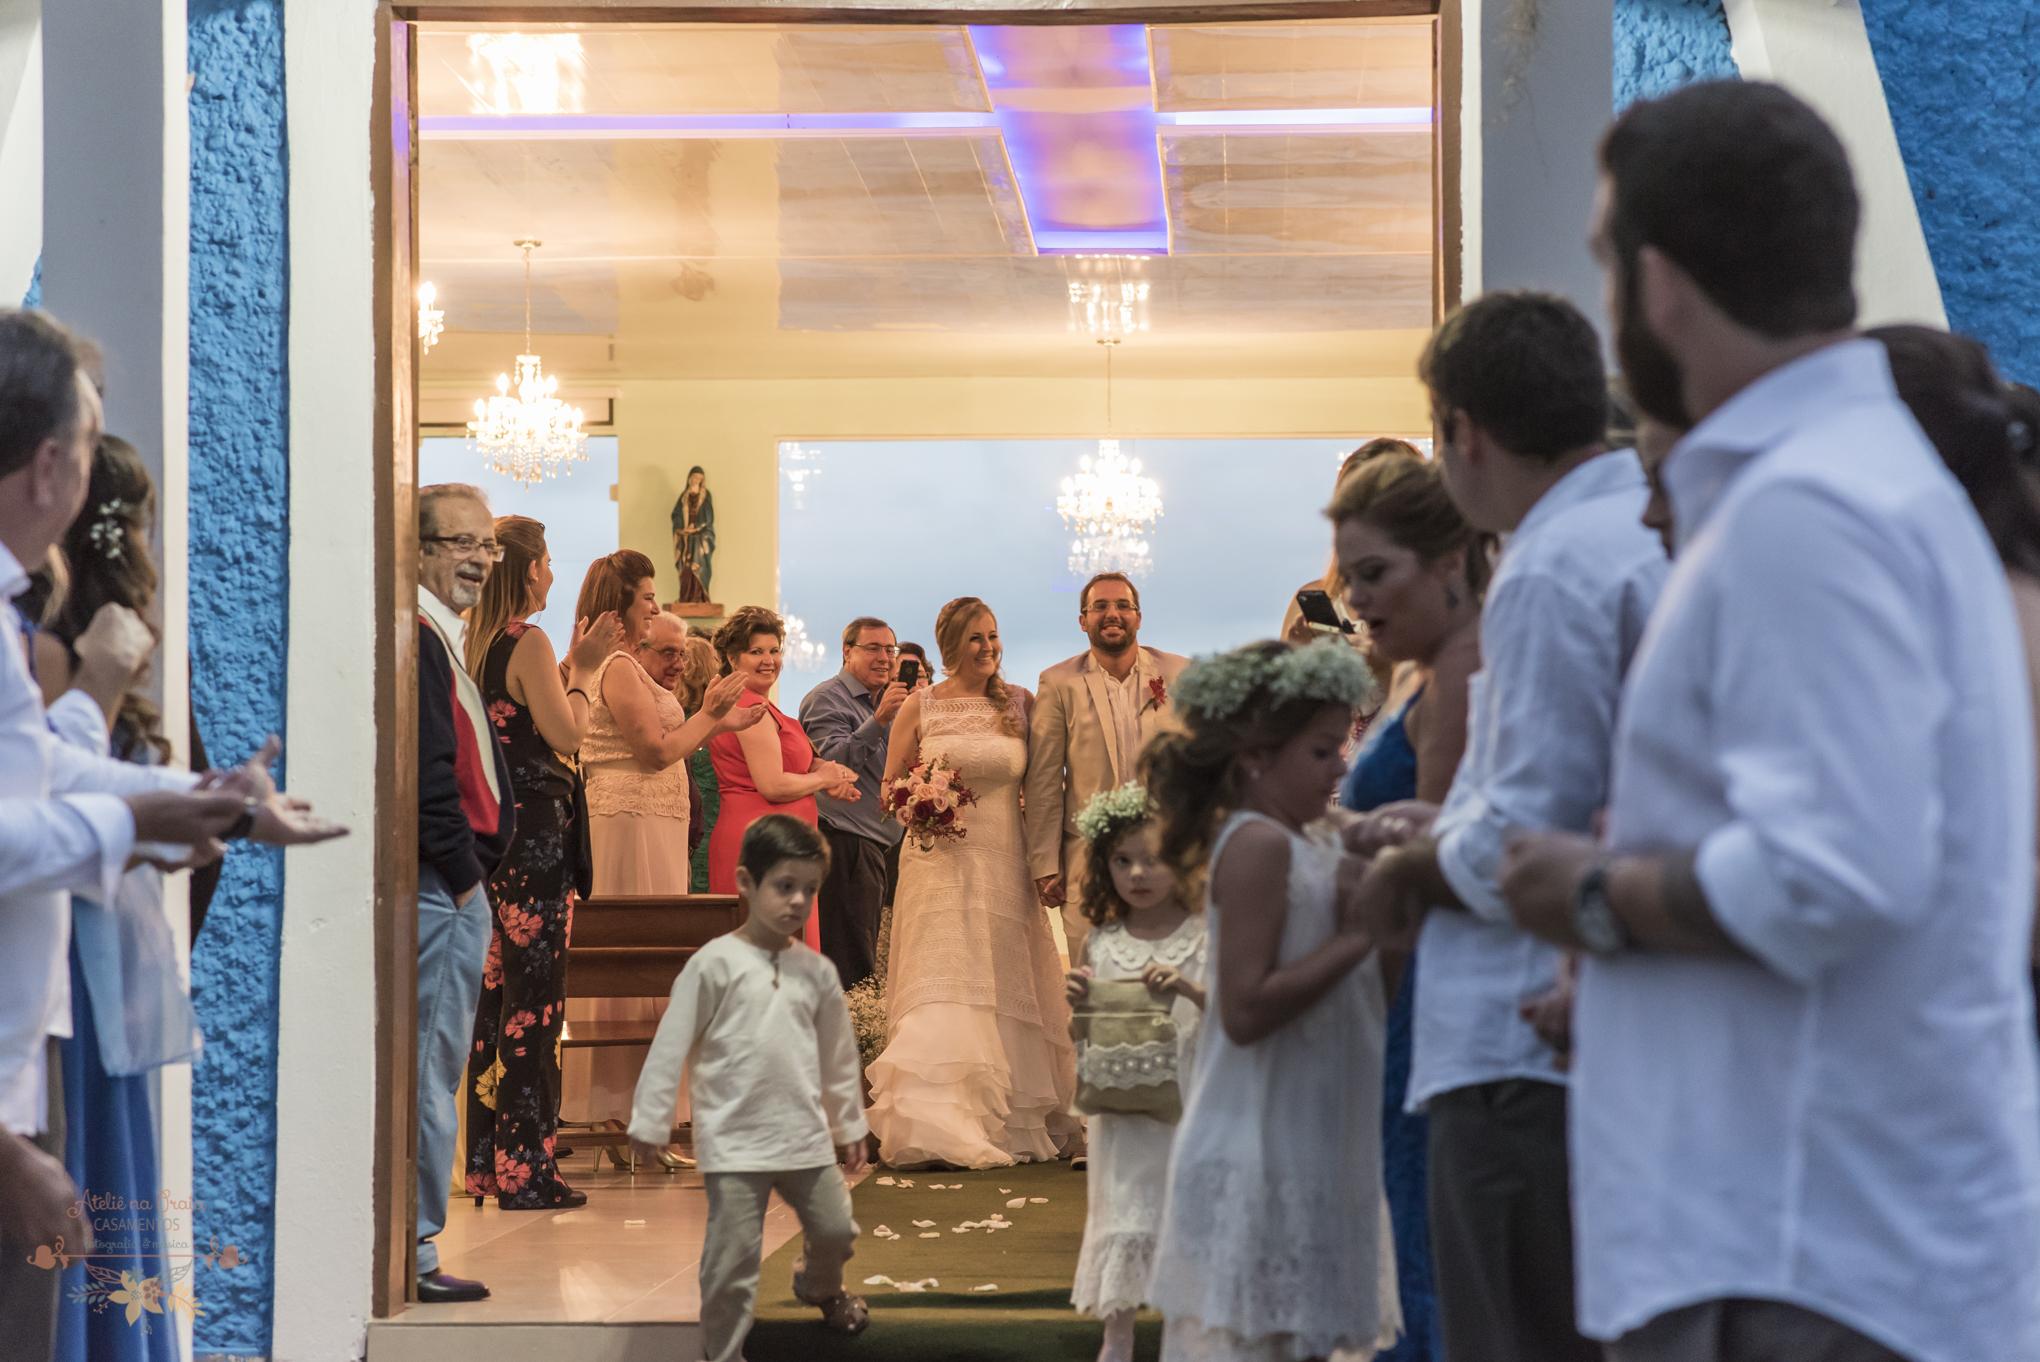 04-Cerimonia-Atelie-na-Praia-Casamento-na-Praia-Erica-Daniel-9091